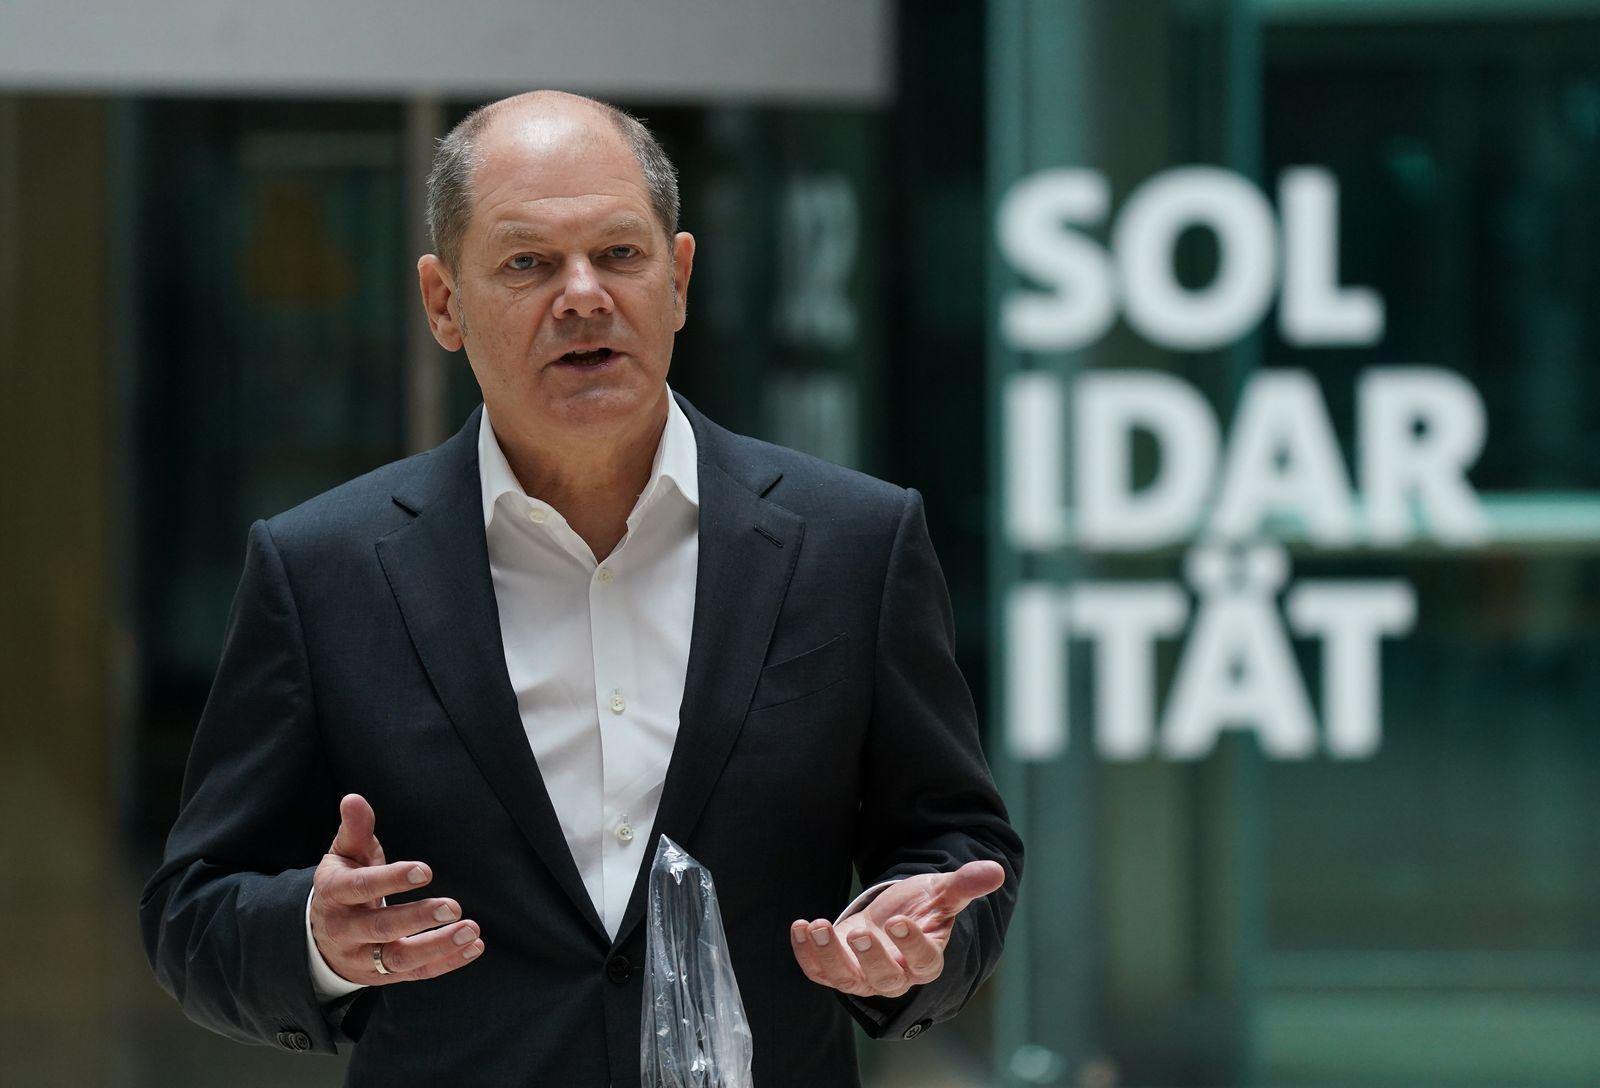 Olaf Scholz / SPD / Coronavirus